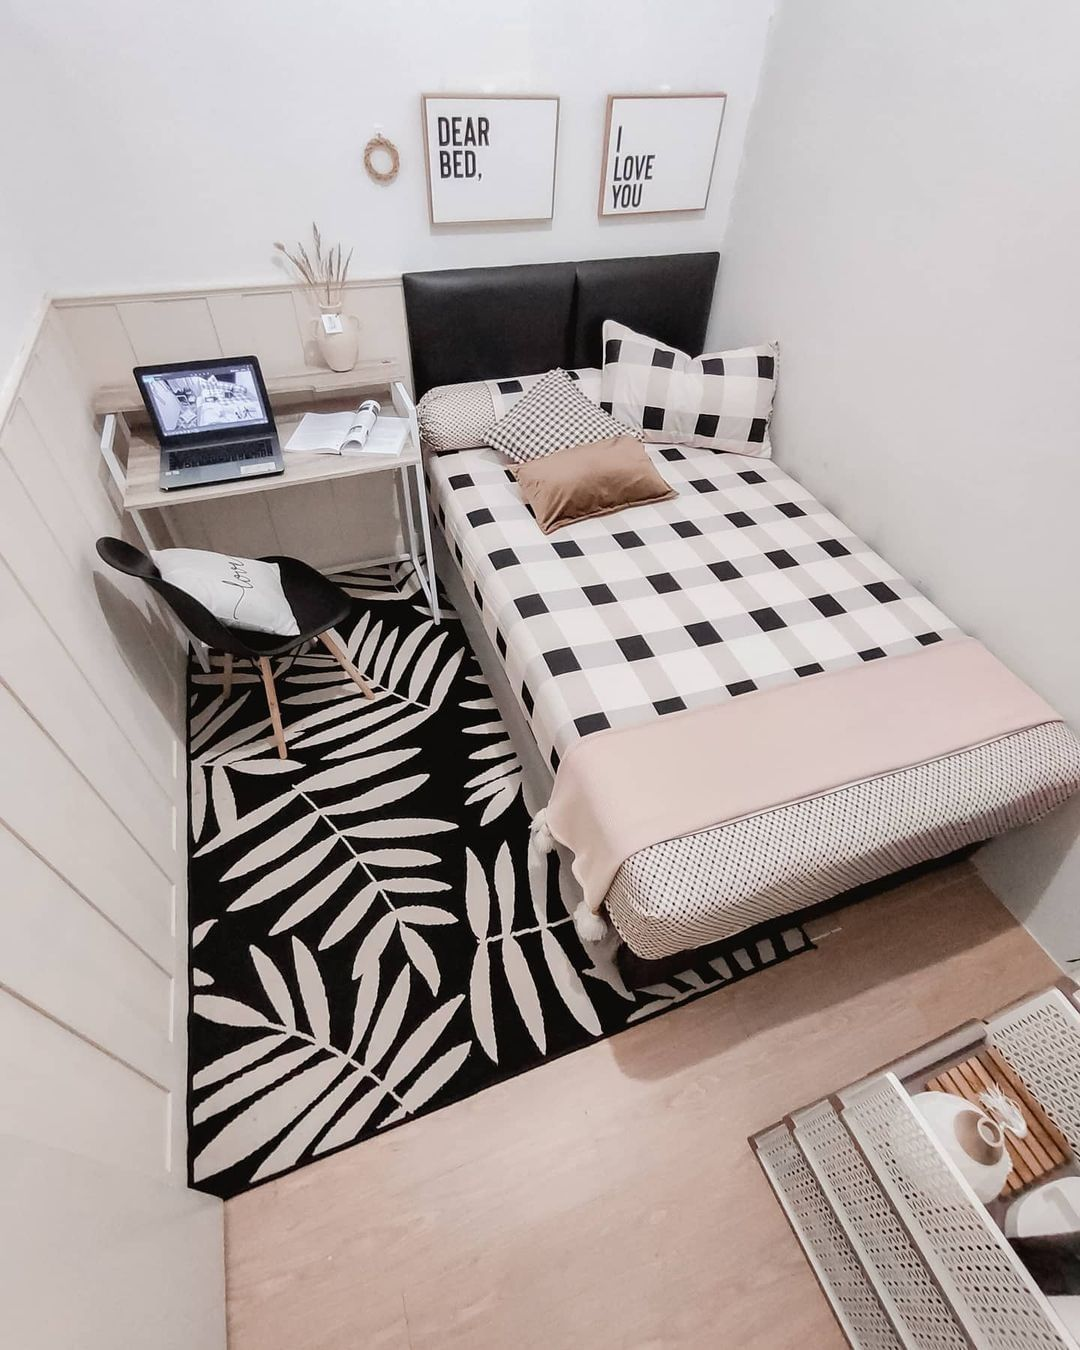 Desain Kamar Tidur Minimalis_7